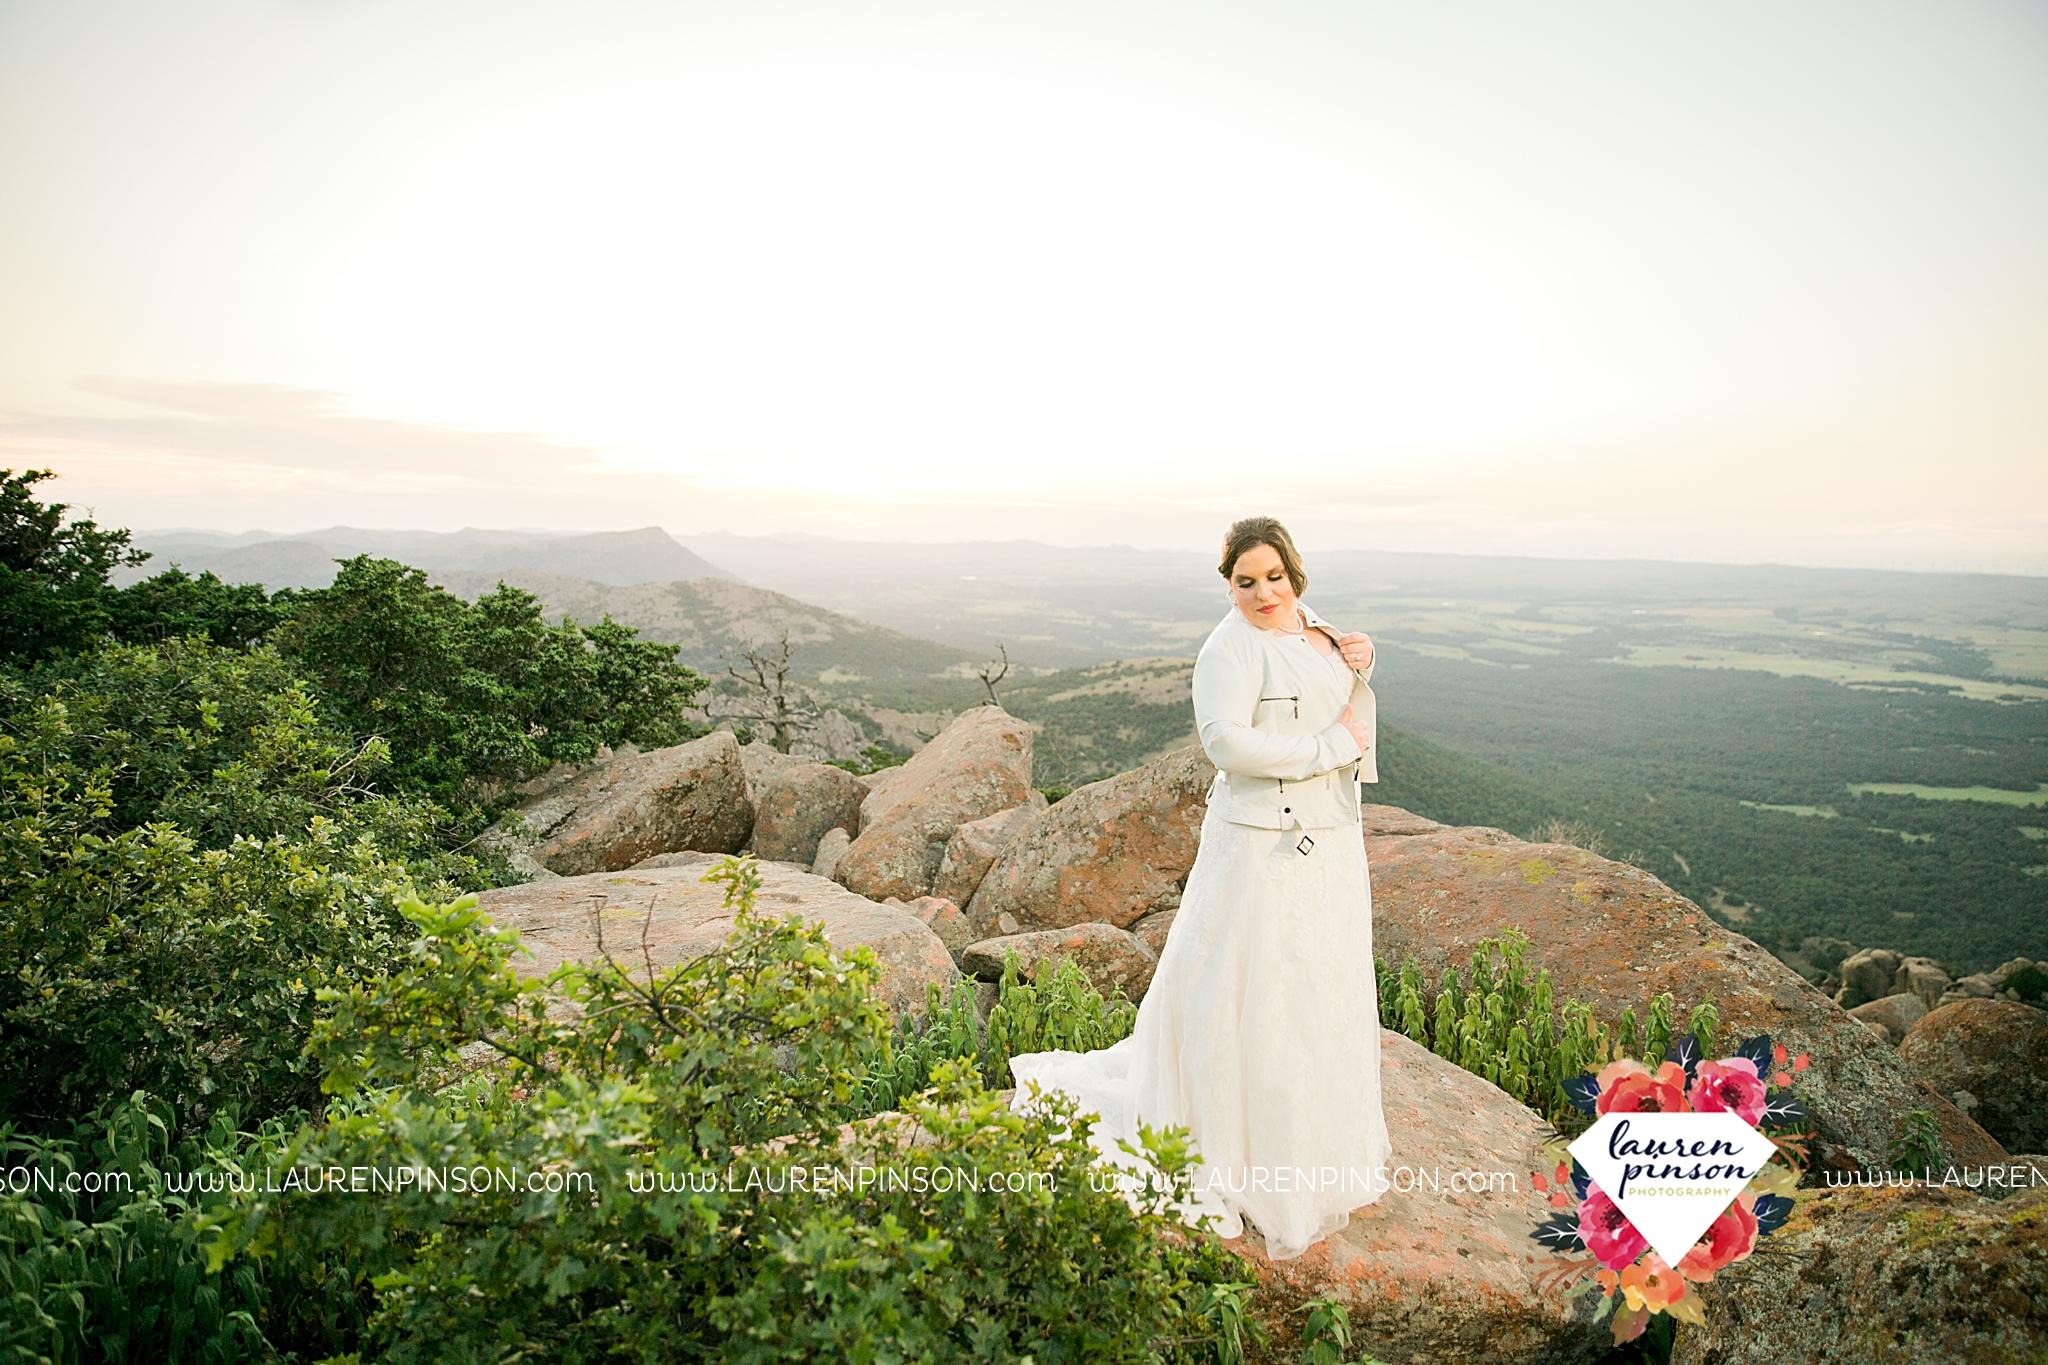 wichita-falls-texas-walters-lawton-oklahoma-wedding-photographer-wichita-mountains-bridal-portraits_3173.jpg